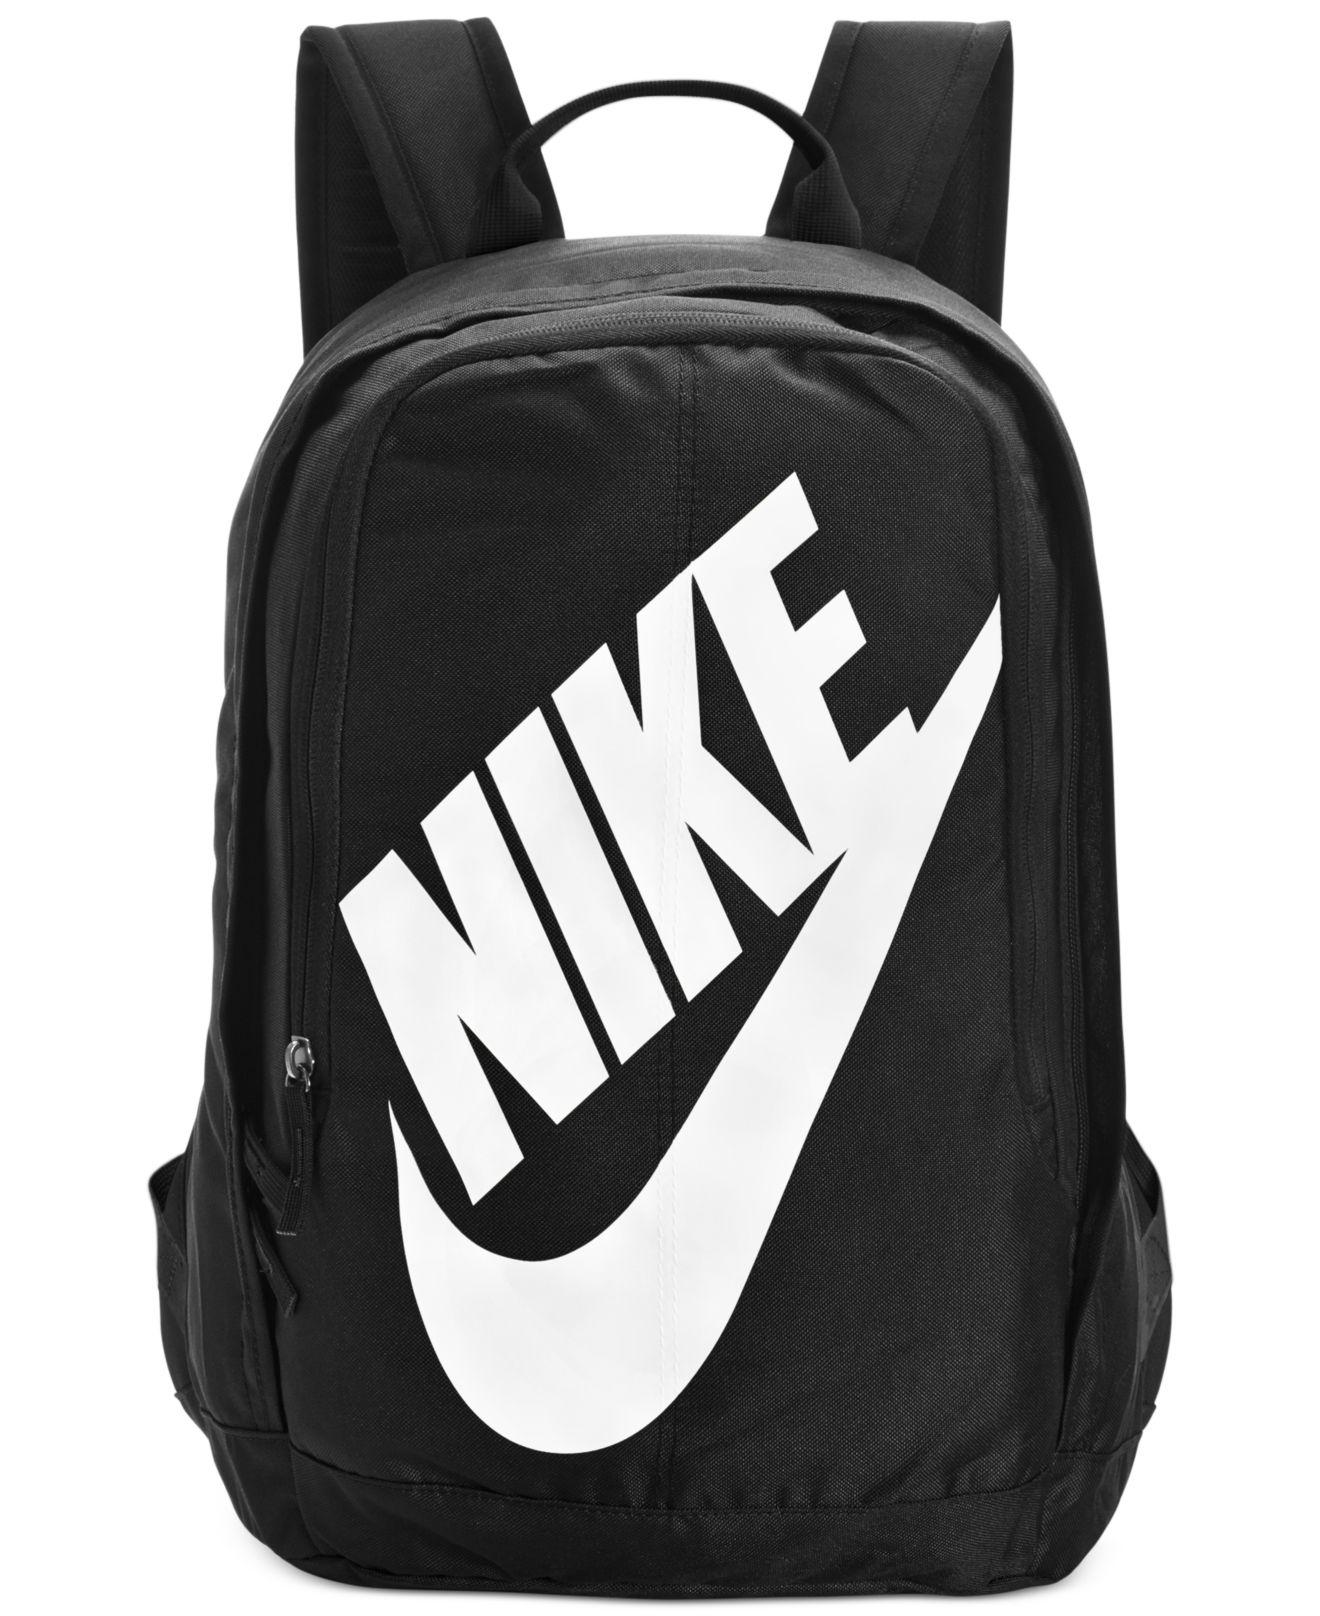 61ebd266d12c Lyst - Nike Hayward Neon Backpack in Black for Men